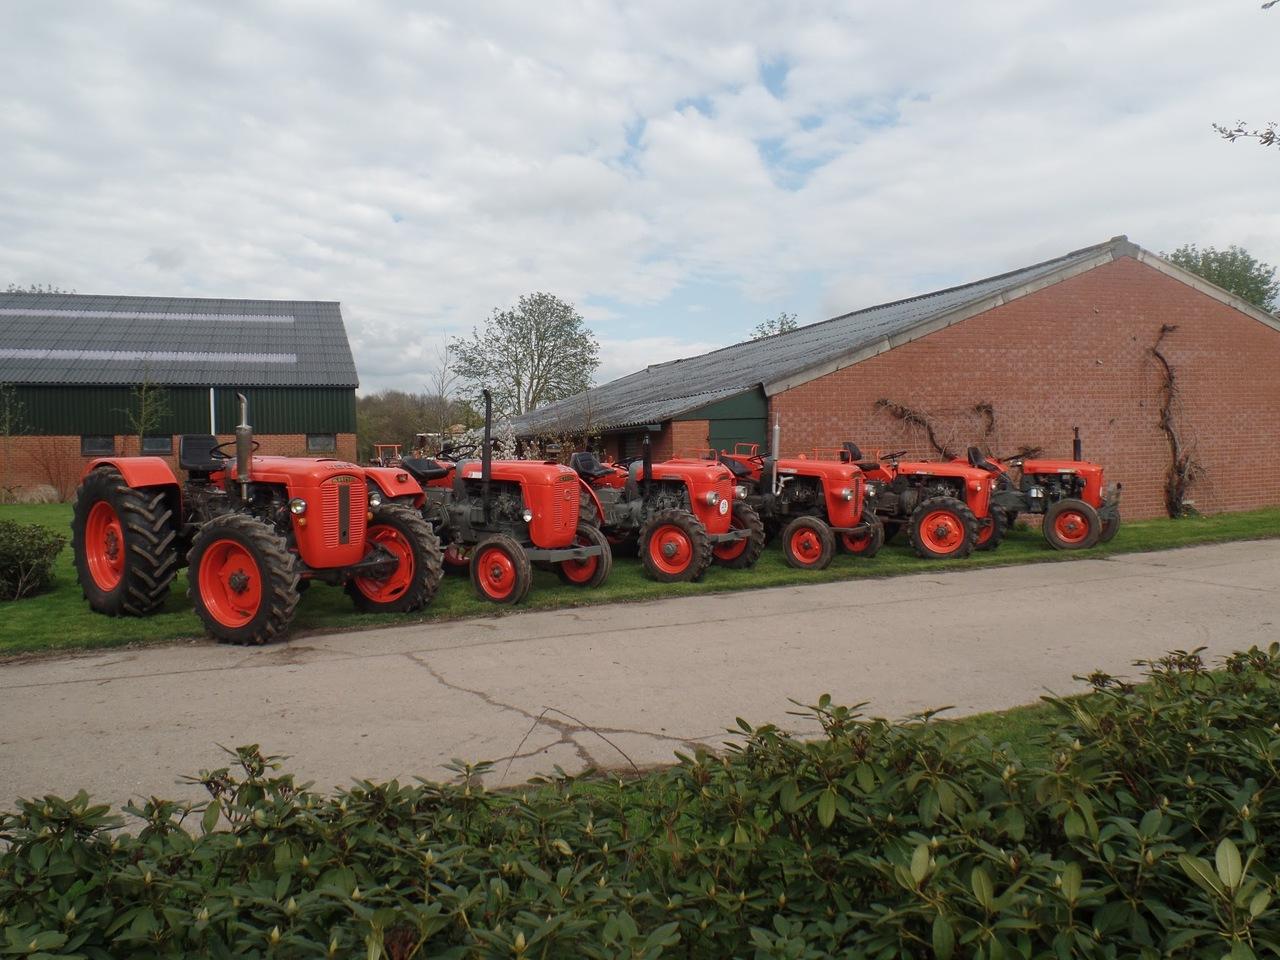 [SAME] trattori SAME nei Paesi Bassi